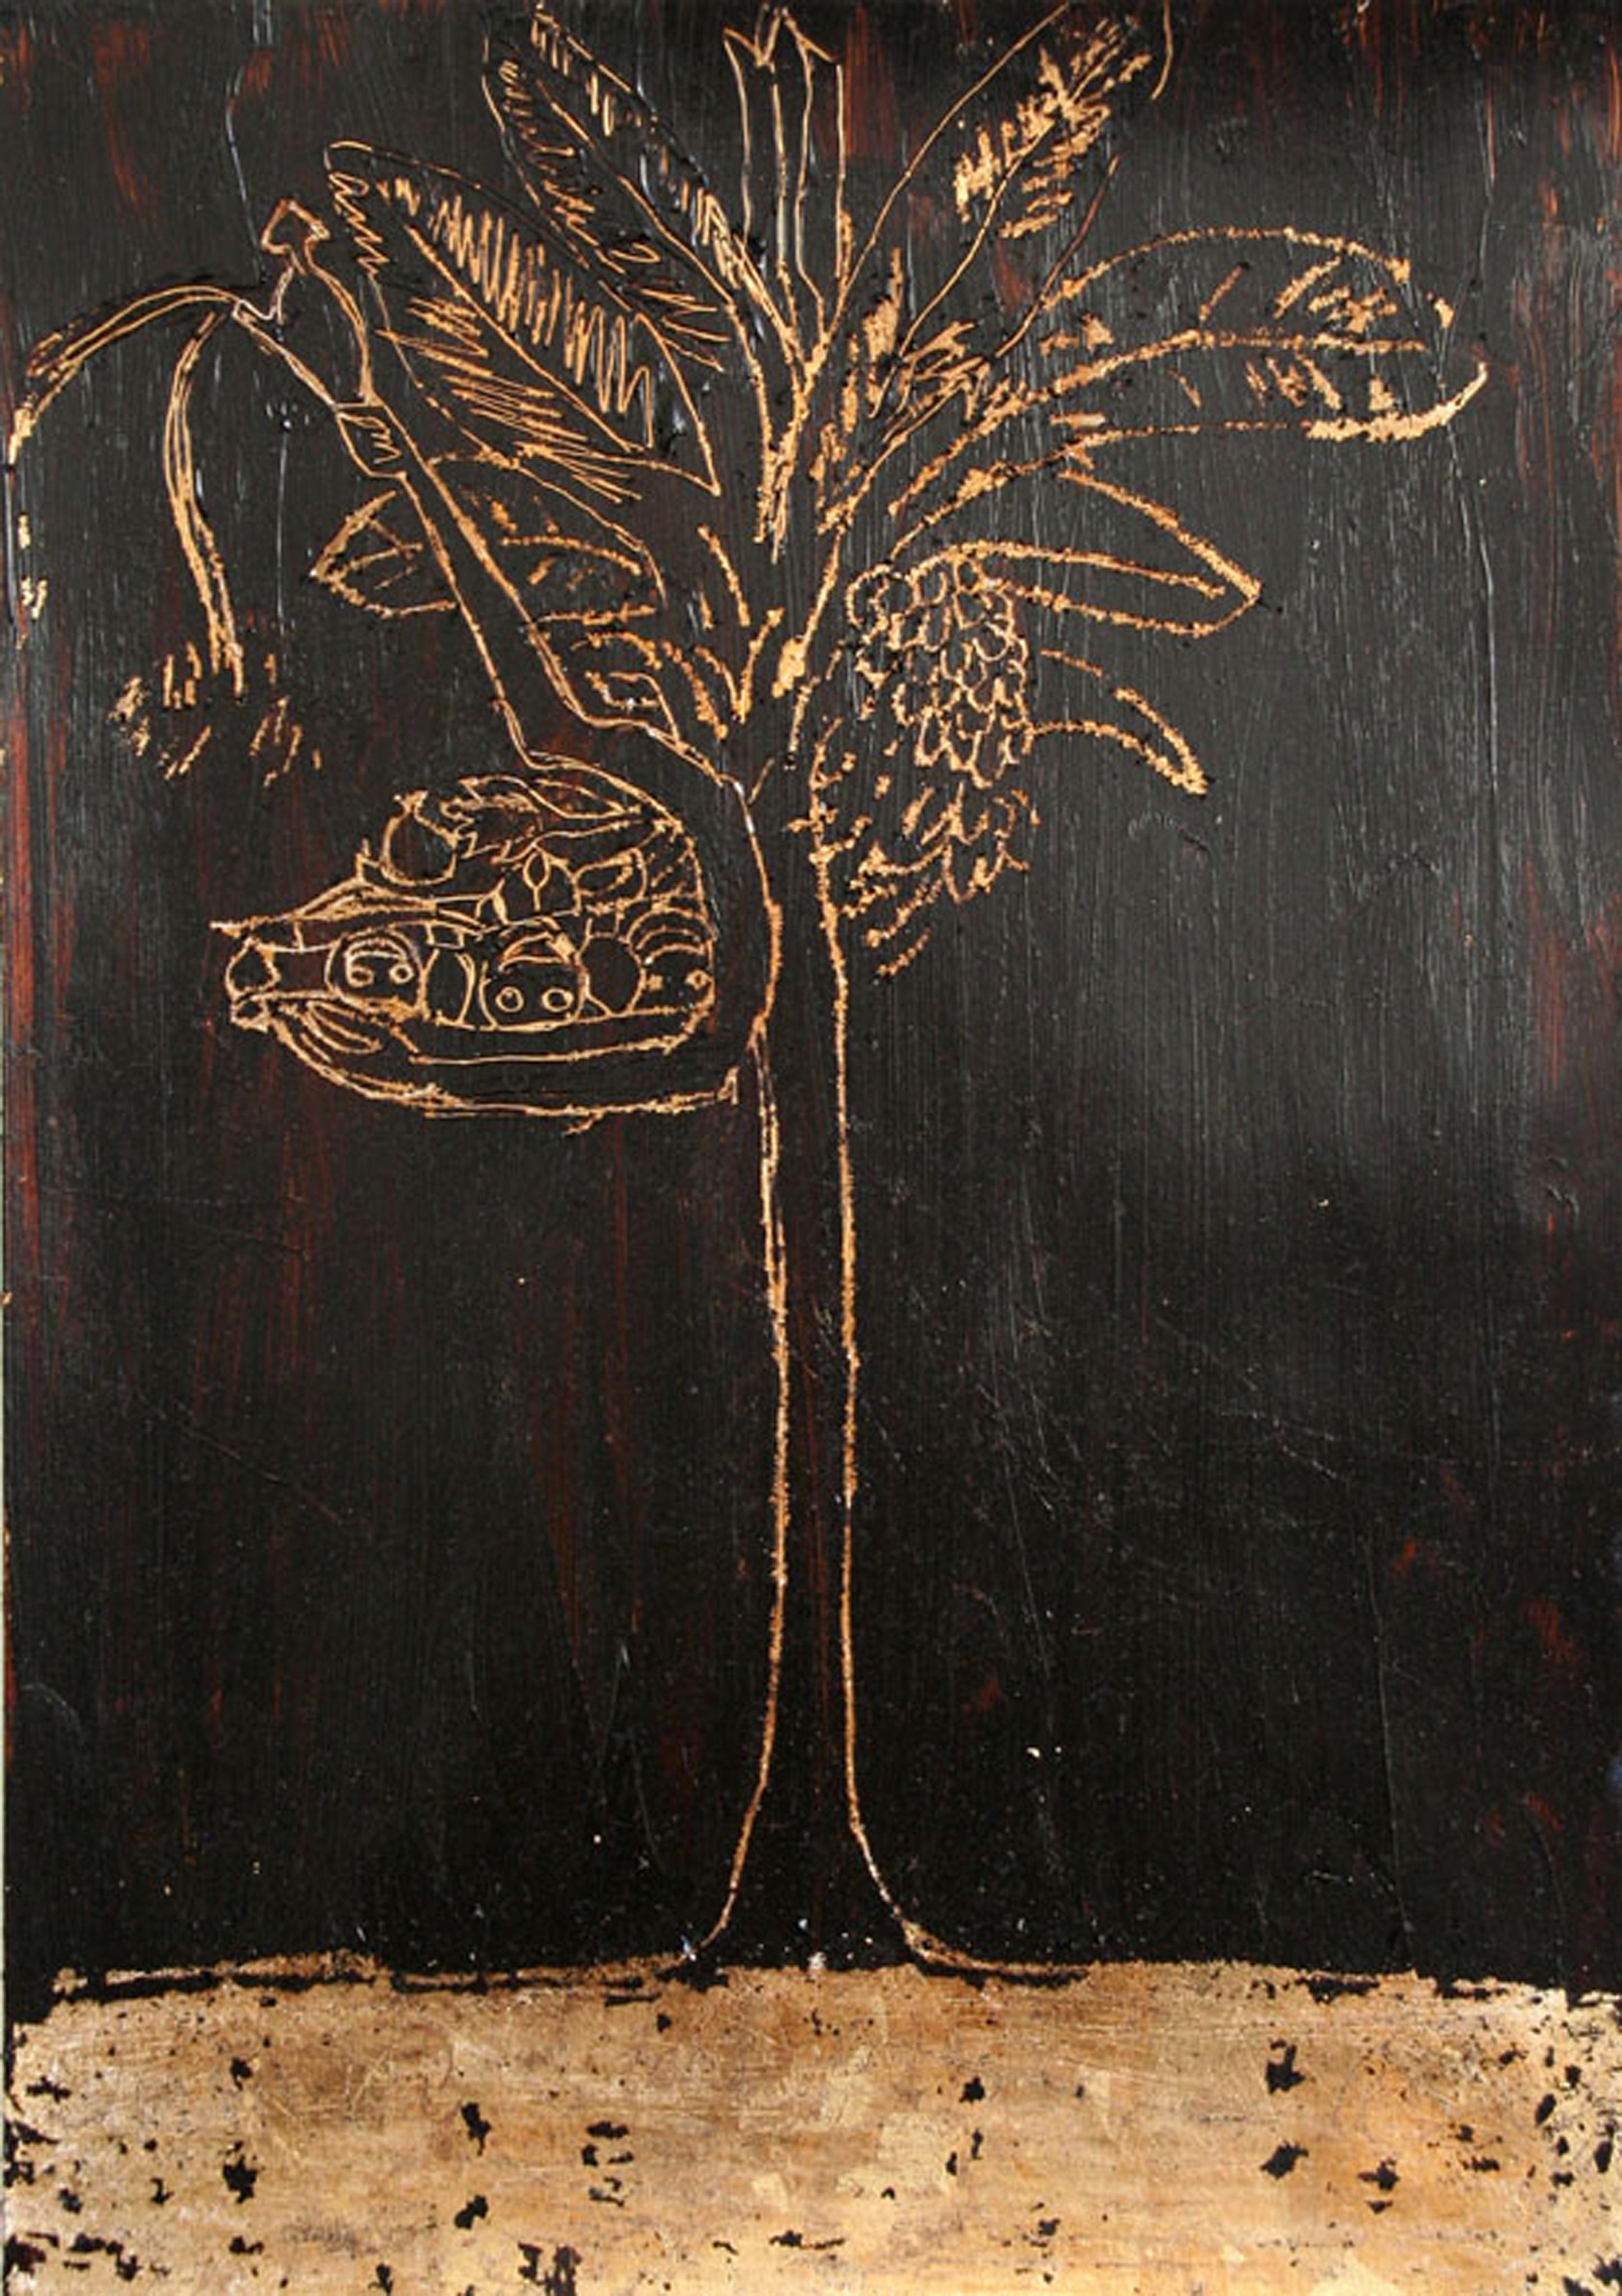 Tree of Life Öl, Gouache auf Blattgold, 29x21cm © Melody LaVerne Bettencourt 2010